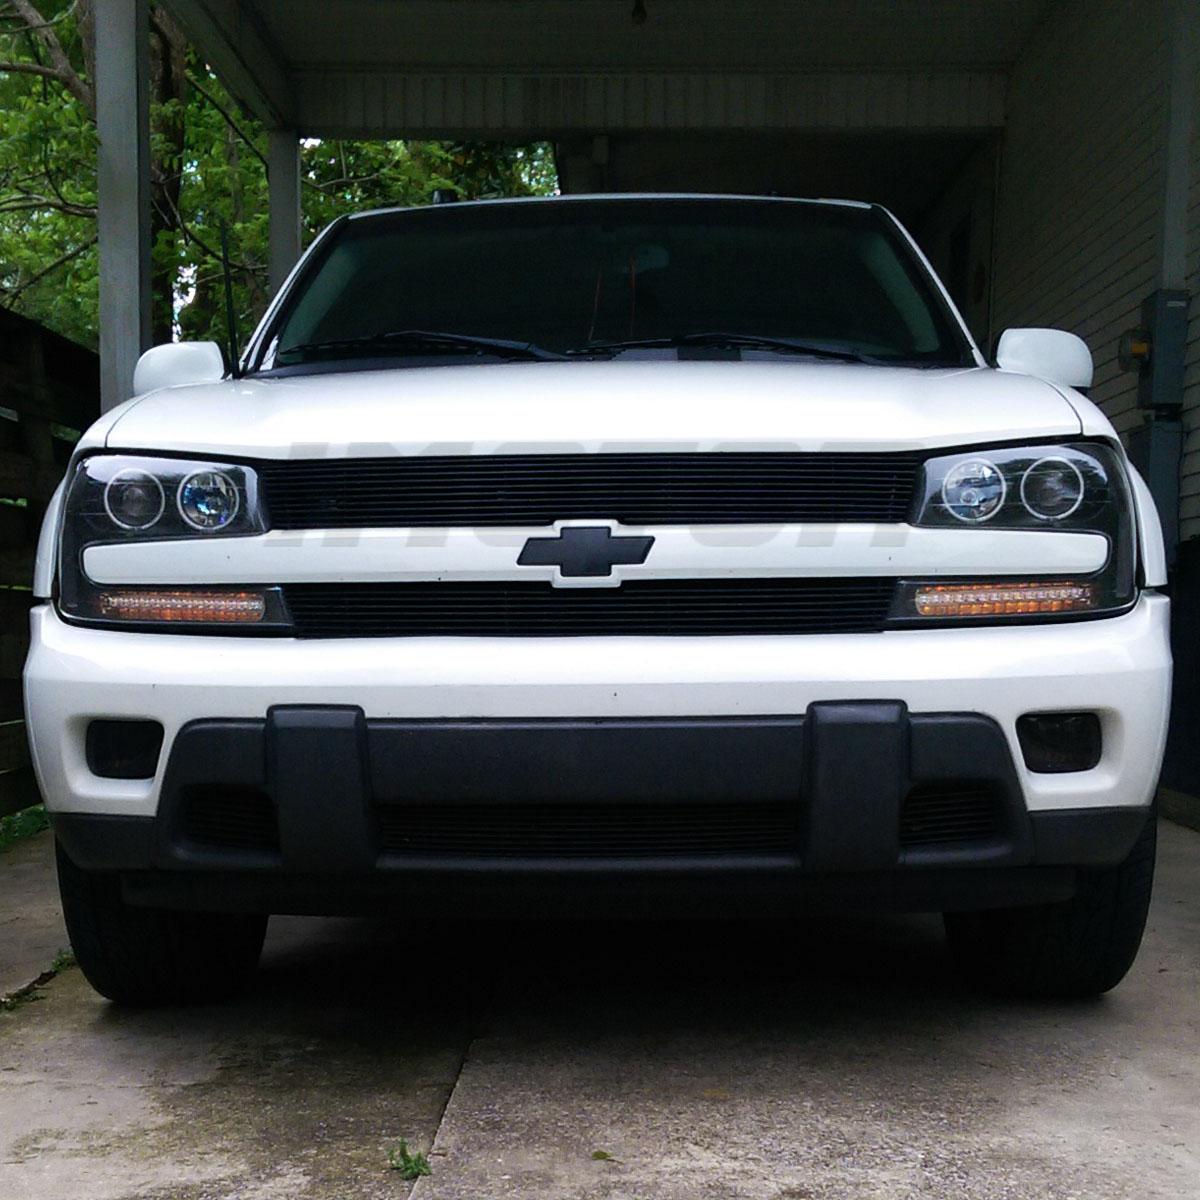 CCFL Halo] 2002-2009 Chevrolet Chevy Trailblazer Projector Black ...